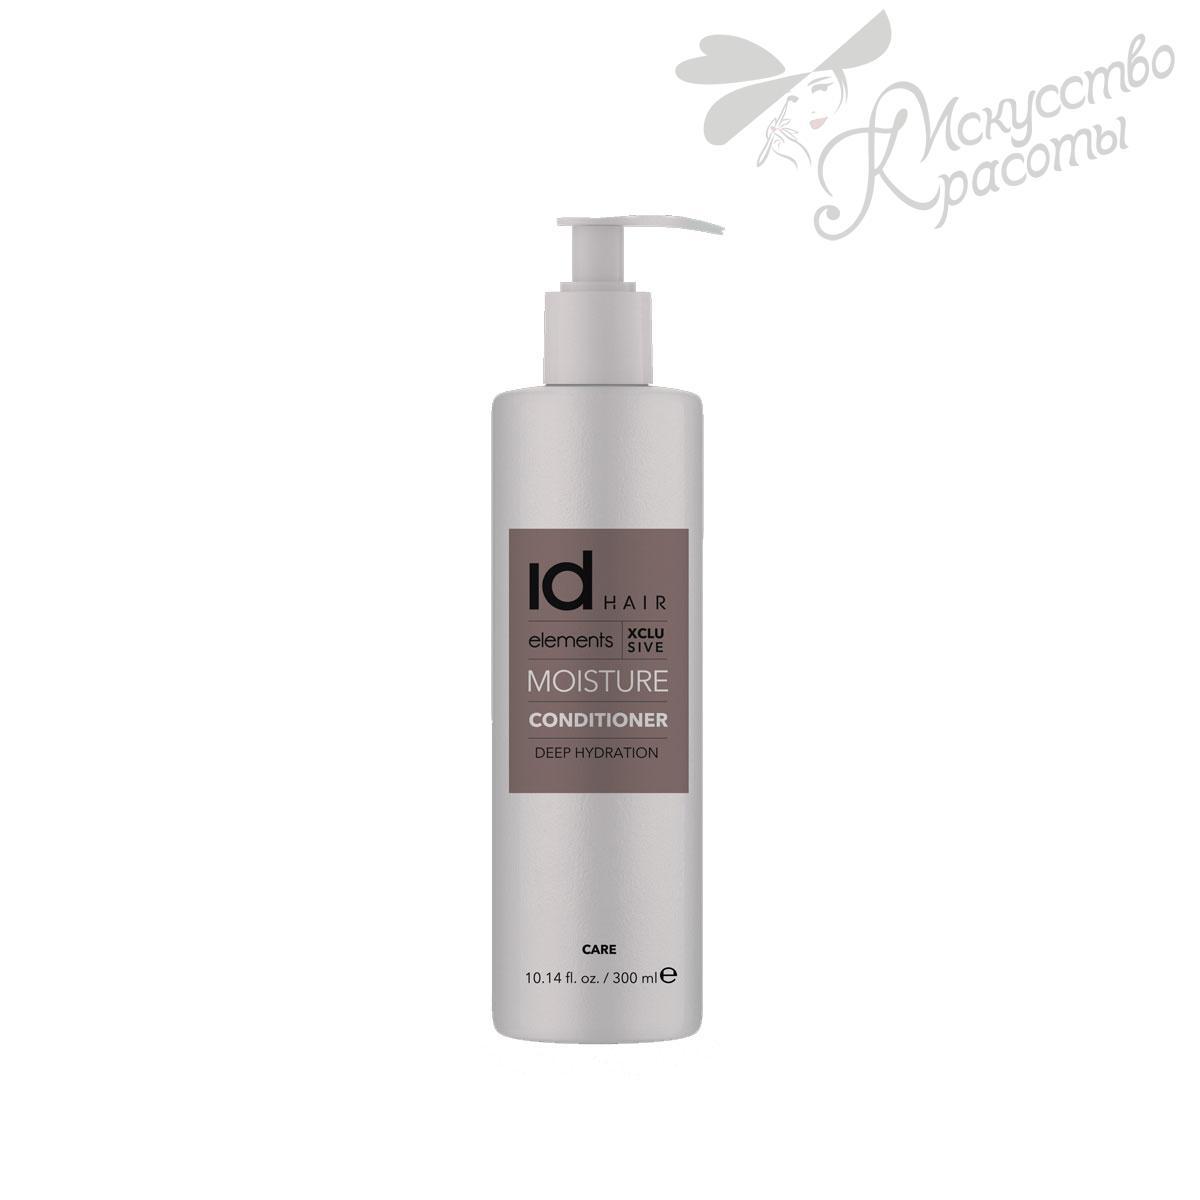 Увлажняющий кондиционер ID Hair Elements XCLS Moisture 1000 мл